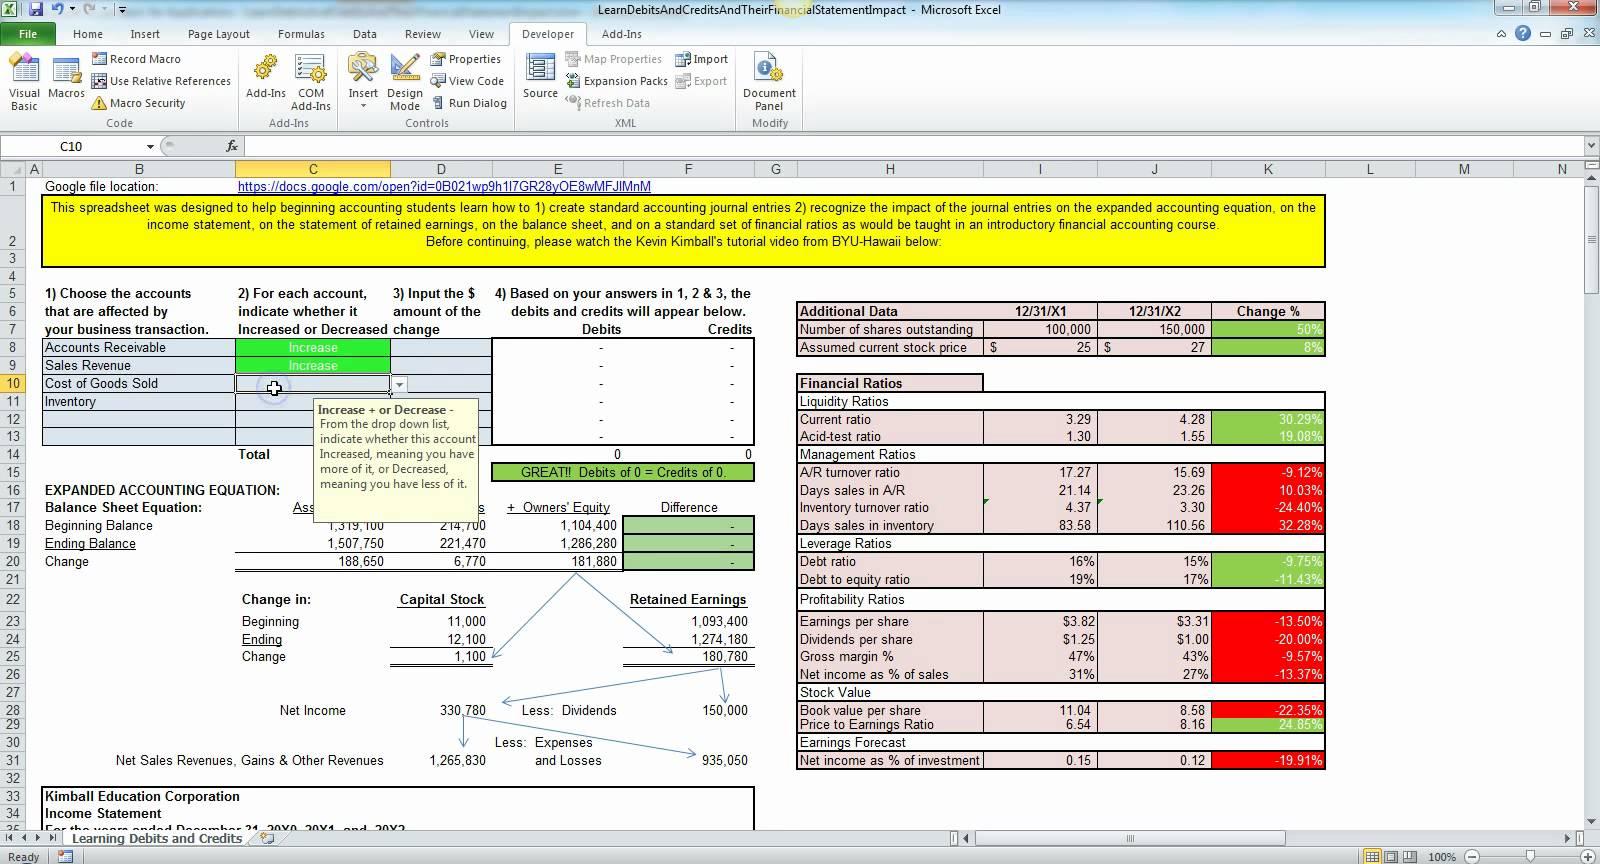 Double Entry Bookkeeping Excel Spreadsheet Free For Double Entry Bookkeeping Spreadsheet Excel  Homebiz4U2Profit